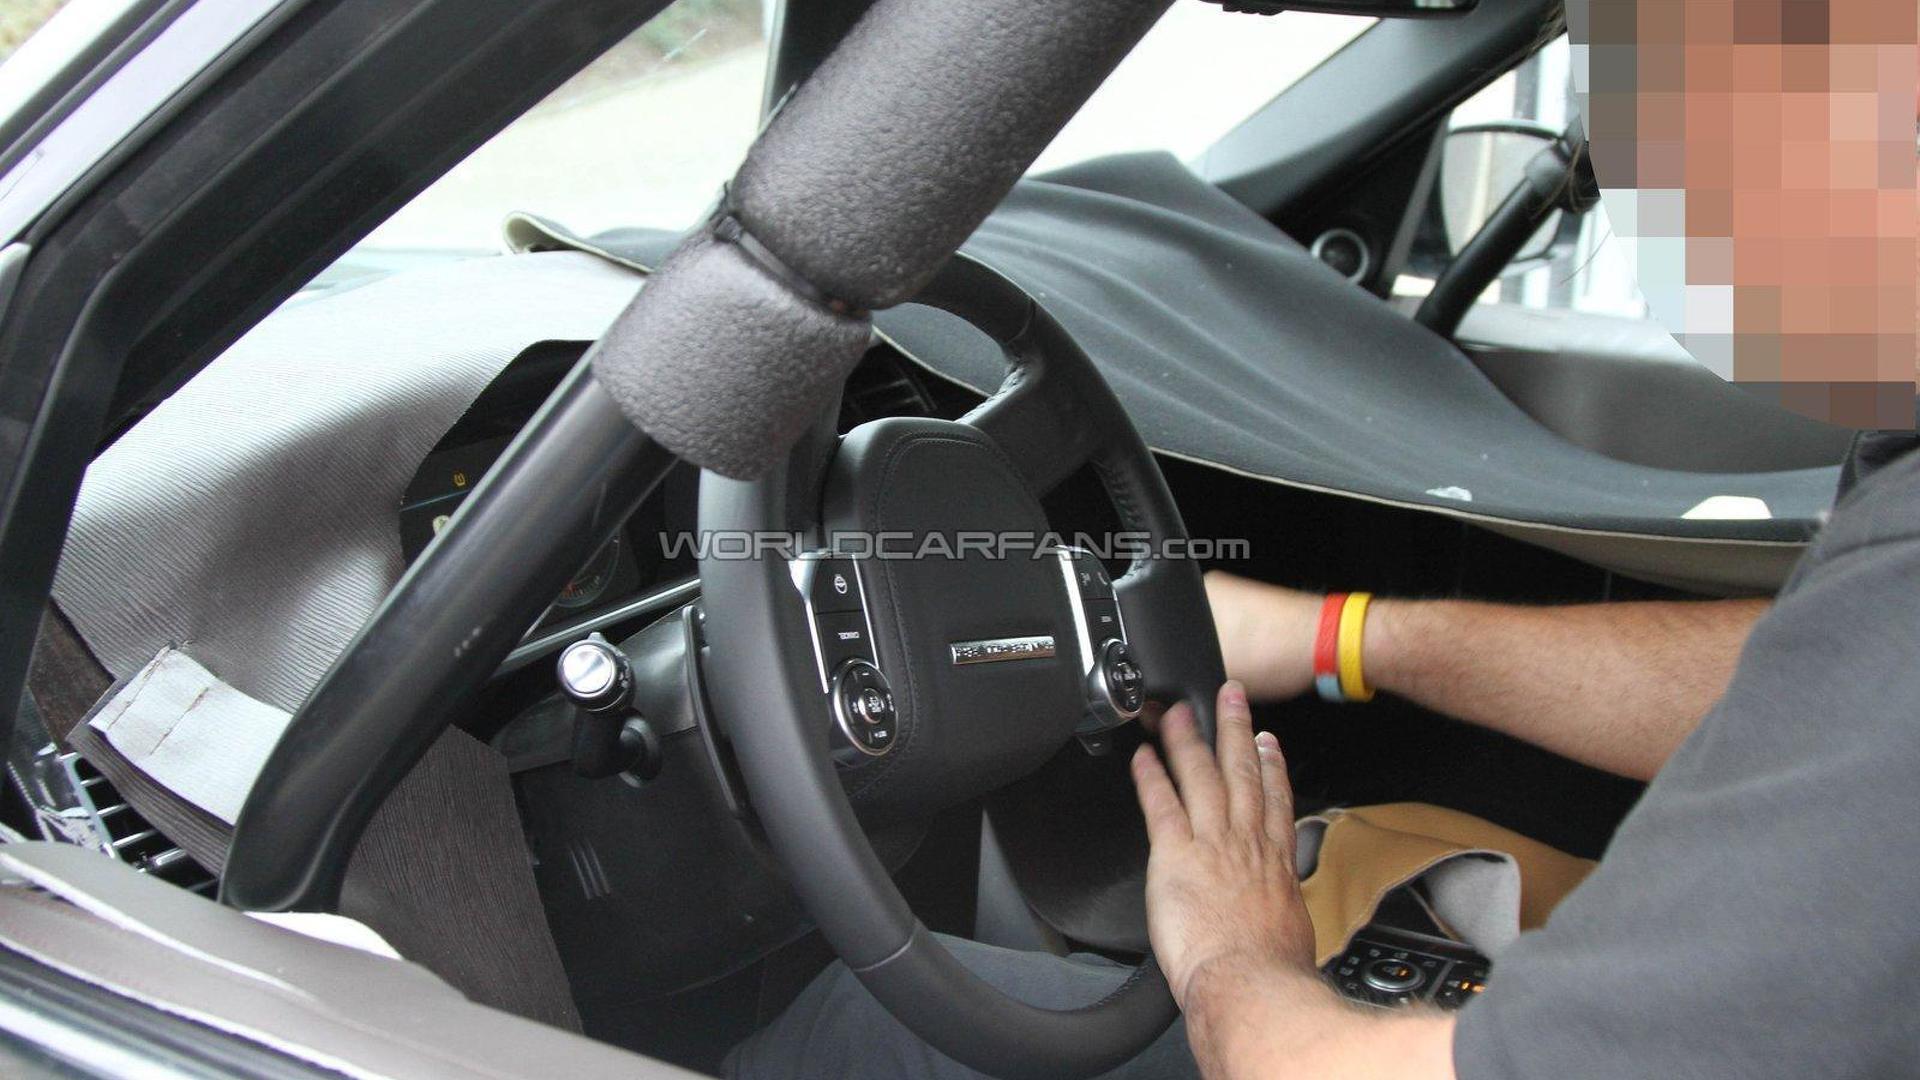 2013 Range Rover spied with interior details